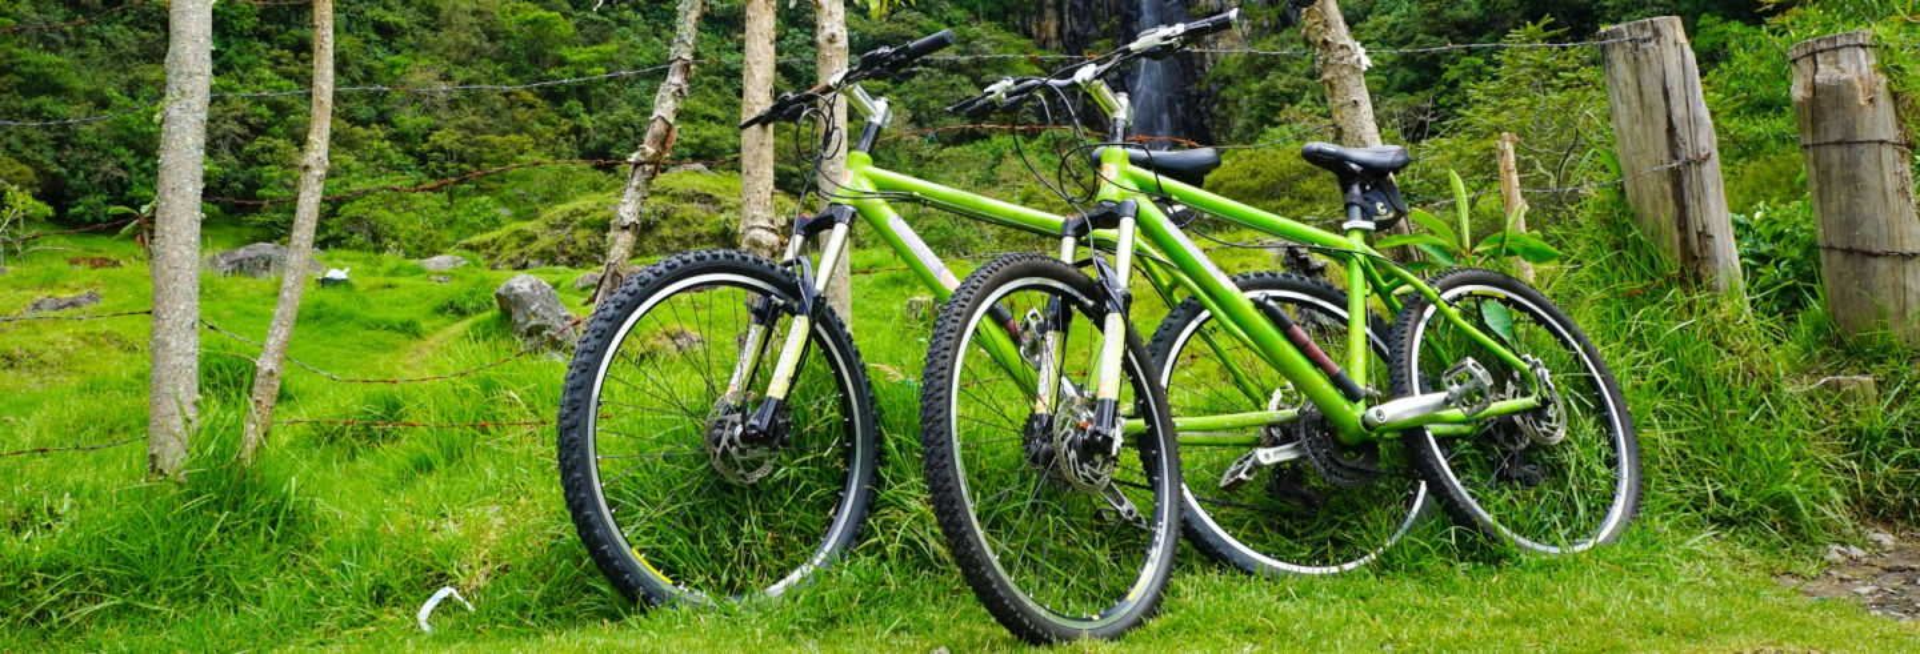 Tour en bicicleta por las montañas de Salento